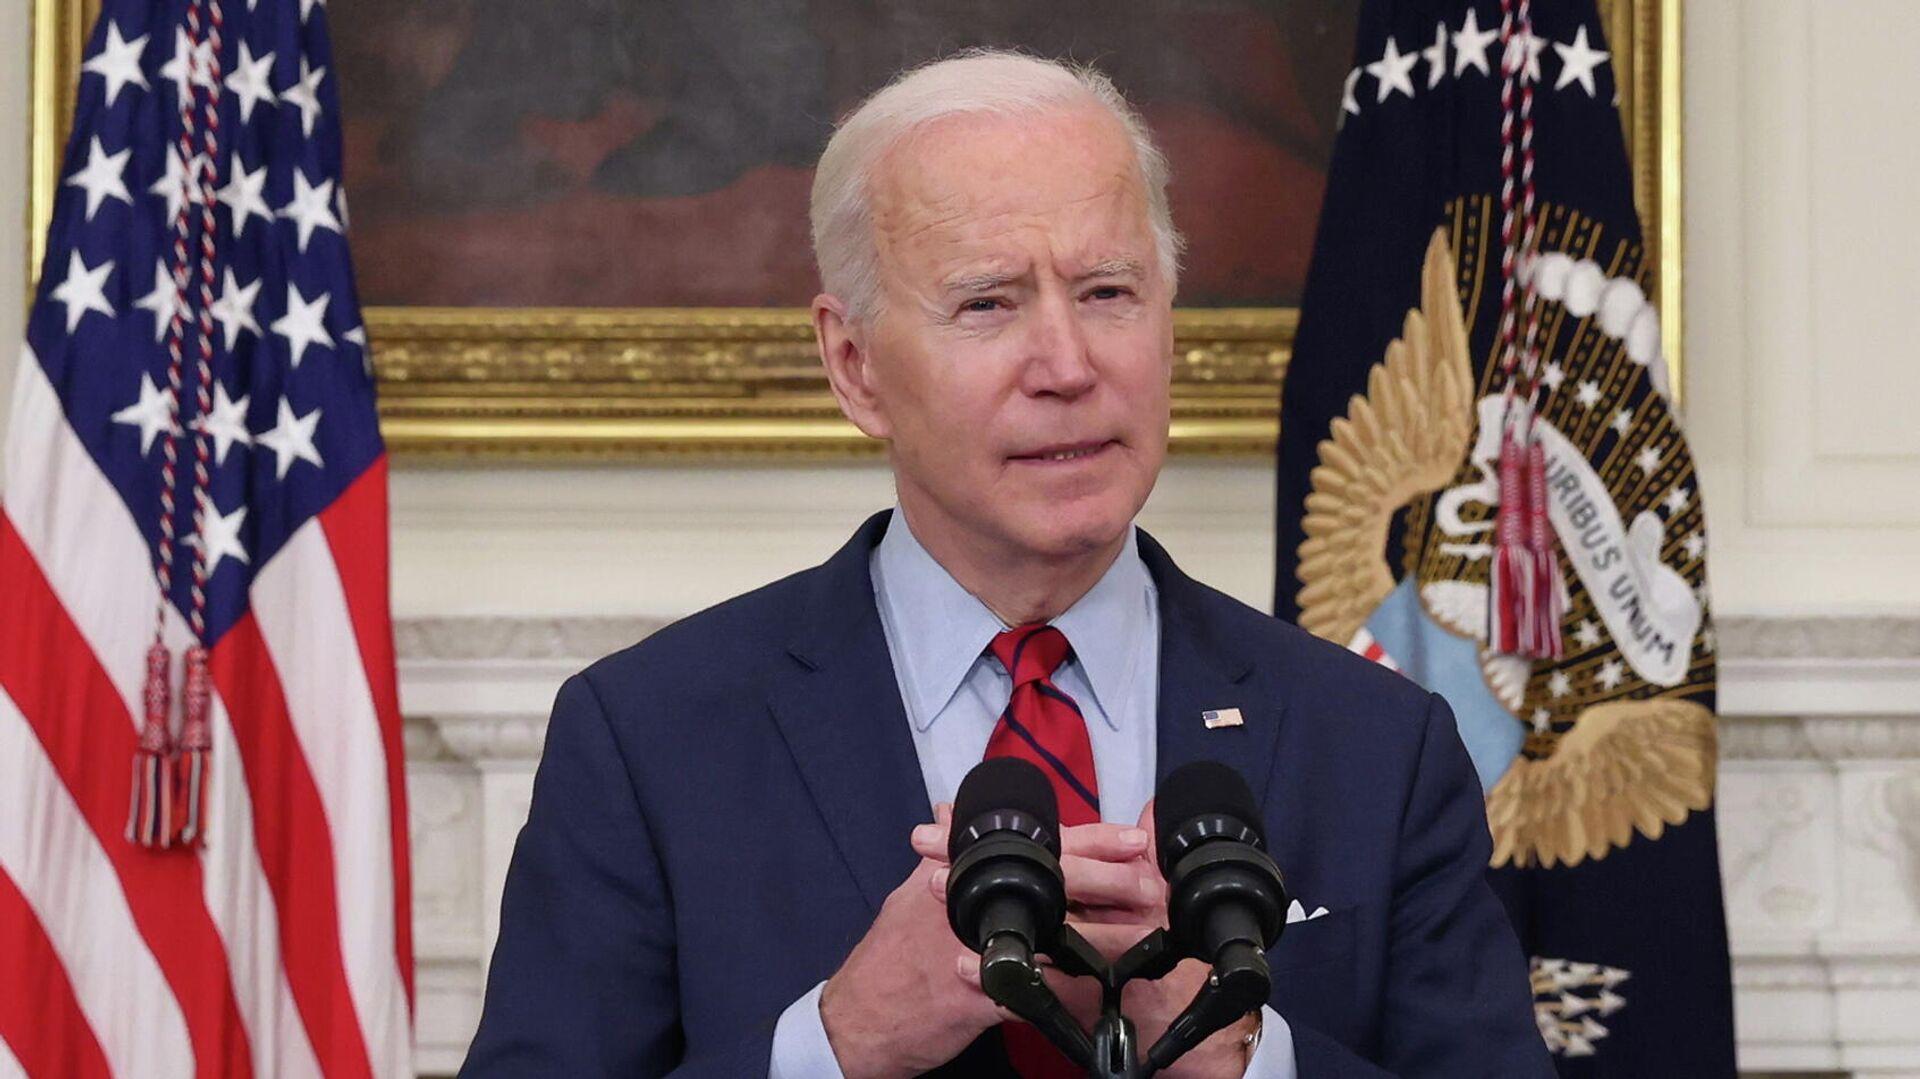 Joe Biden, presidente de EEUU - Sputnik Mundo, 1920, 23.03.2021